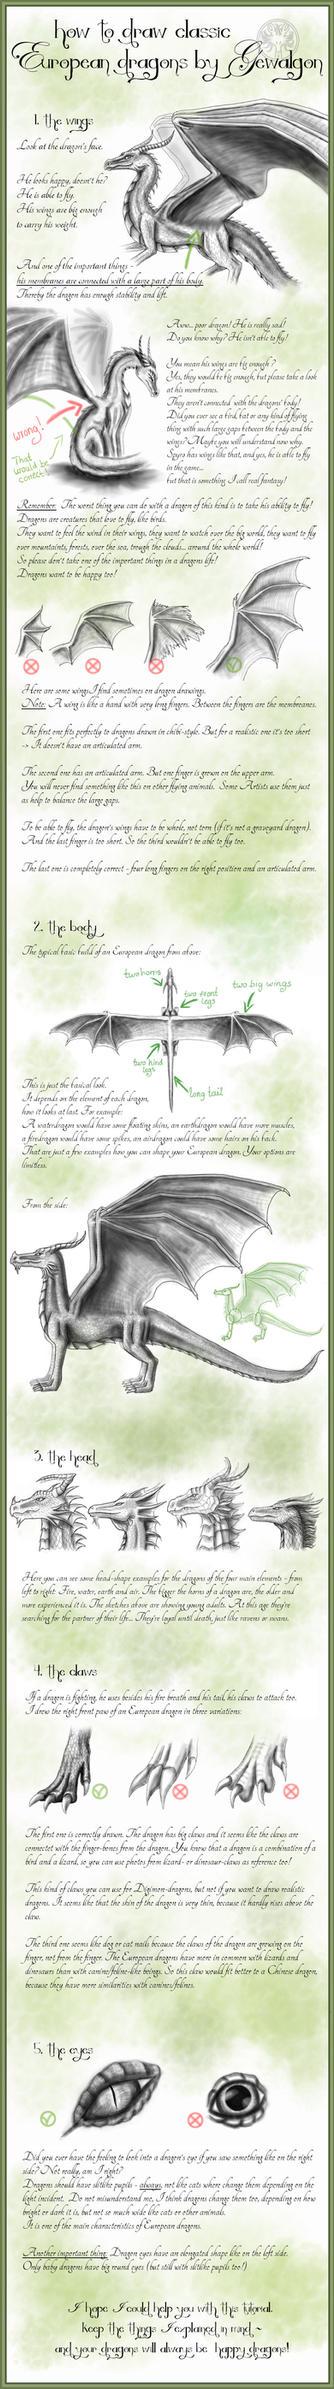 How to draw Classic European Dragons by Gewalgon by Gewalgon